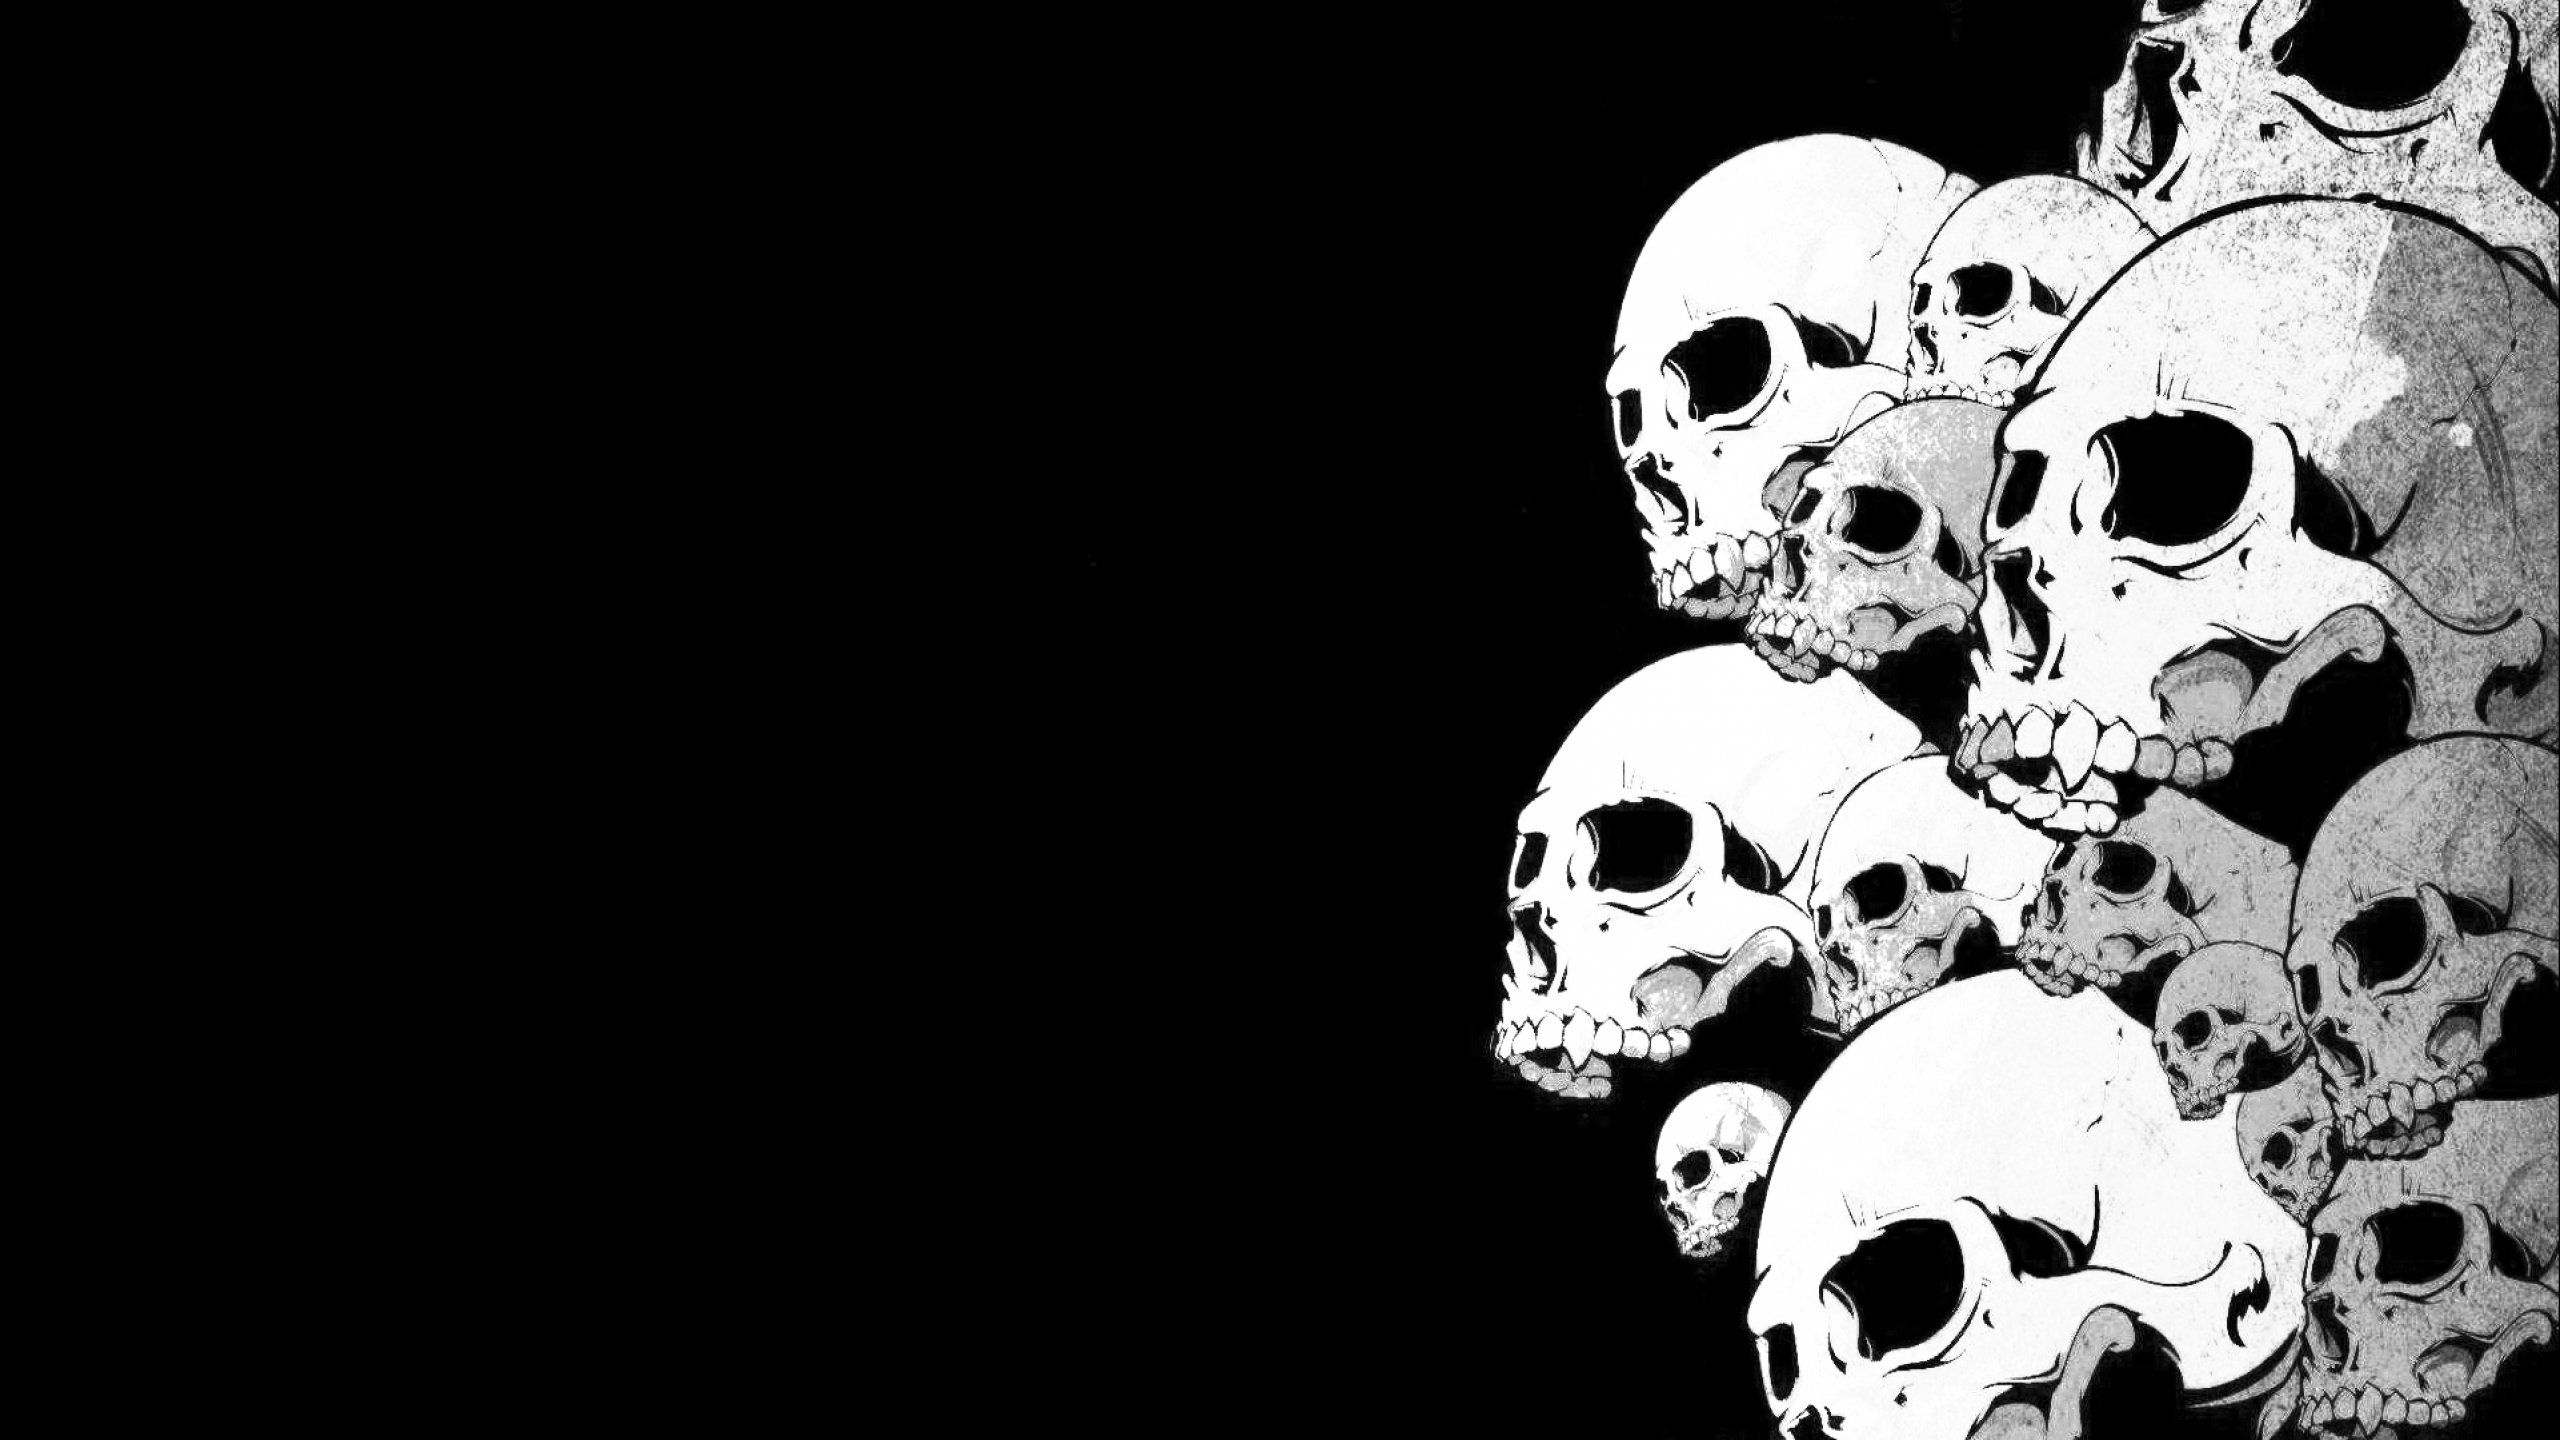 Dark Skull Evil Horror Skulls Art Artwork Skeleton D Wallpaper Skull Wallpaper Laptop Wallpaper Marvel Wallpaper